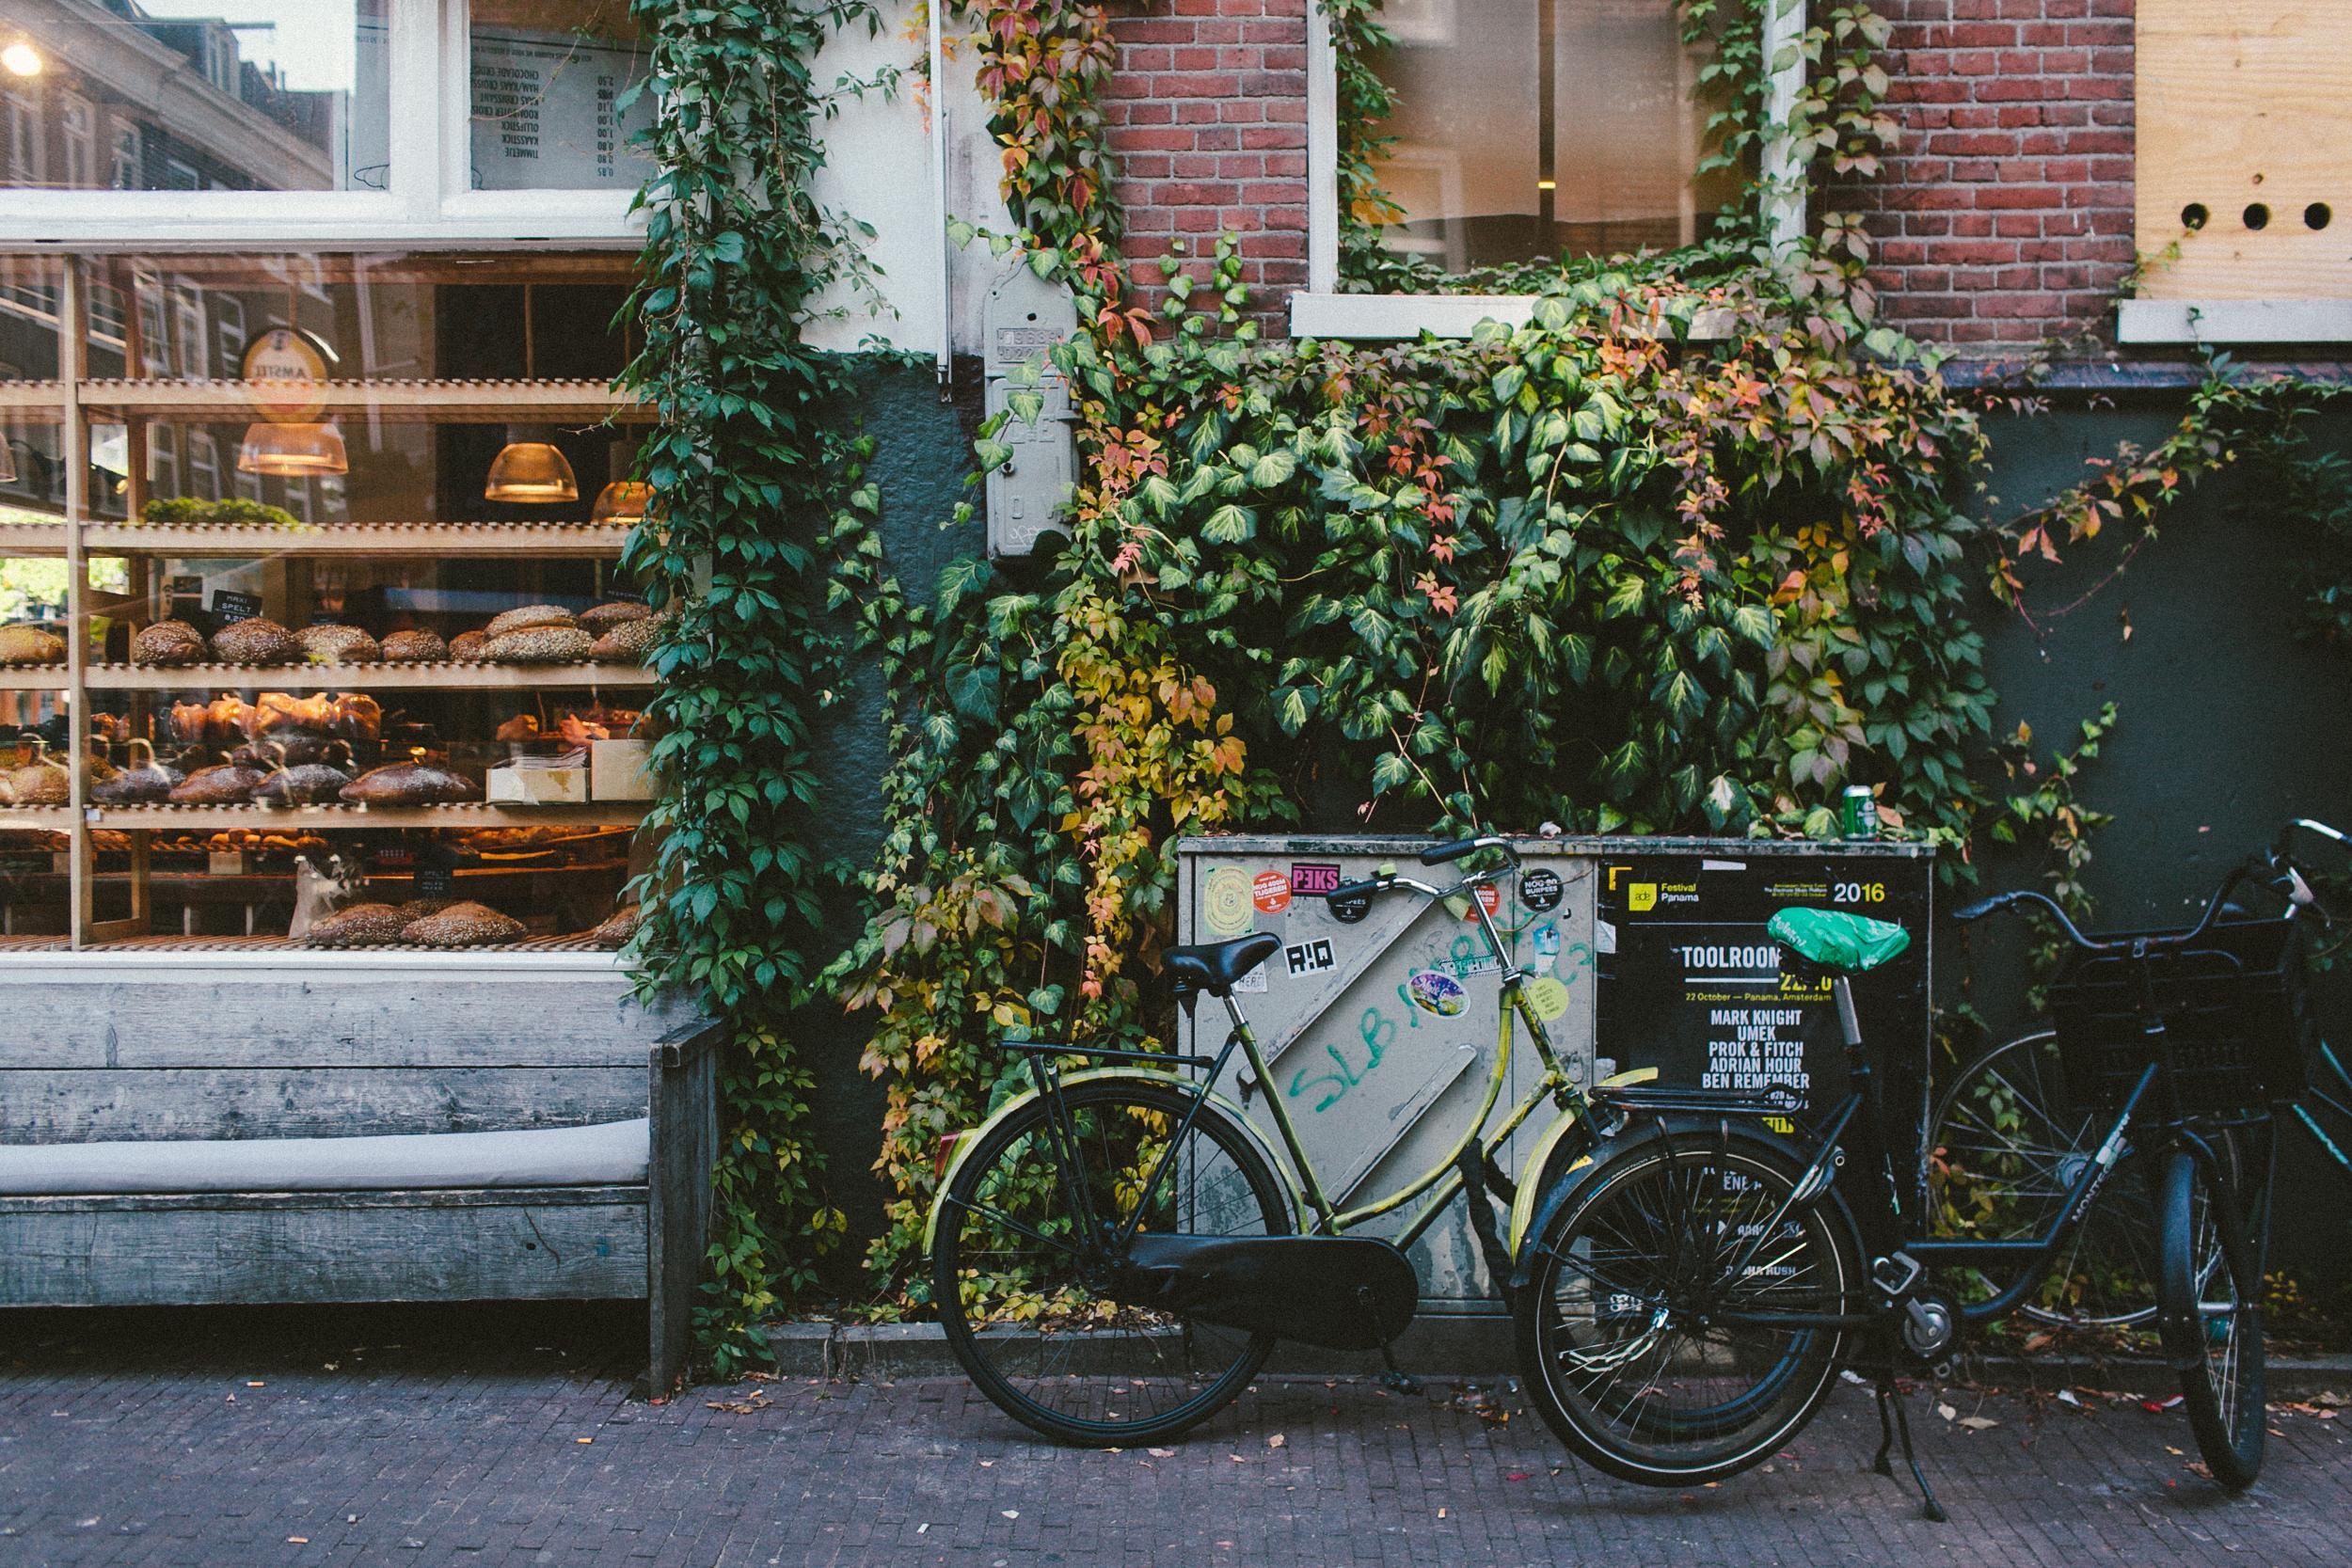 amsterdam_sqsp_10.jpg